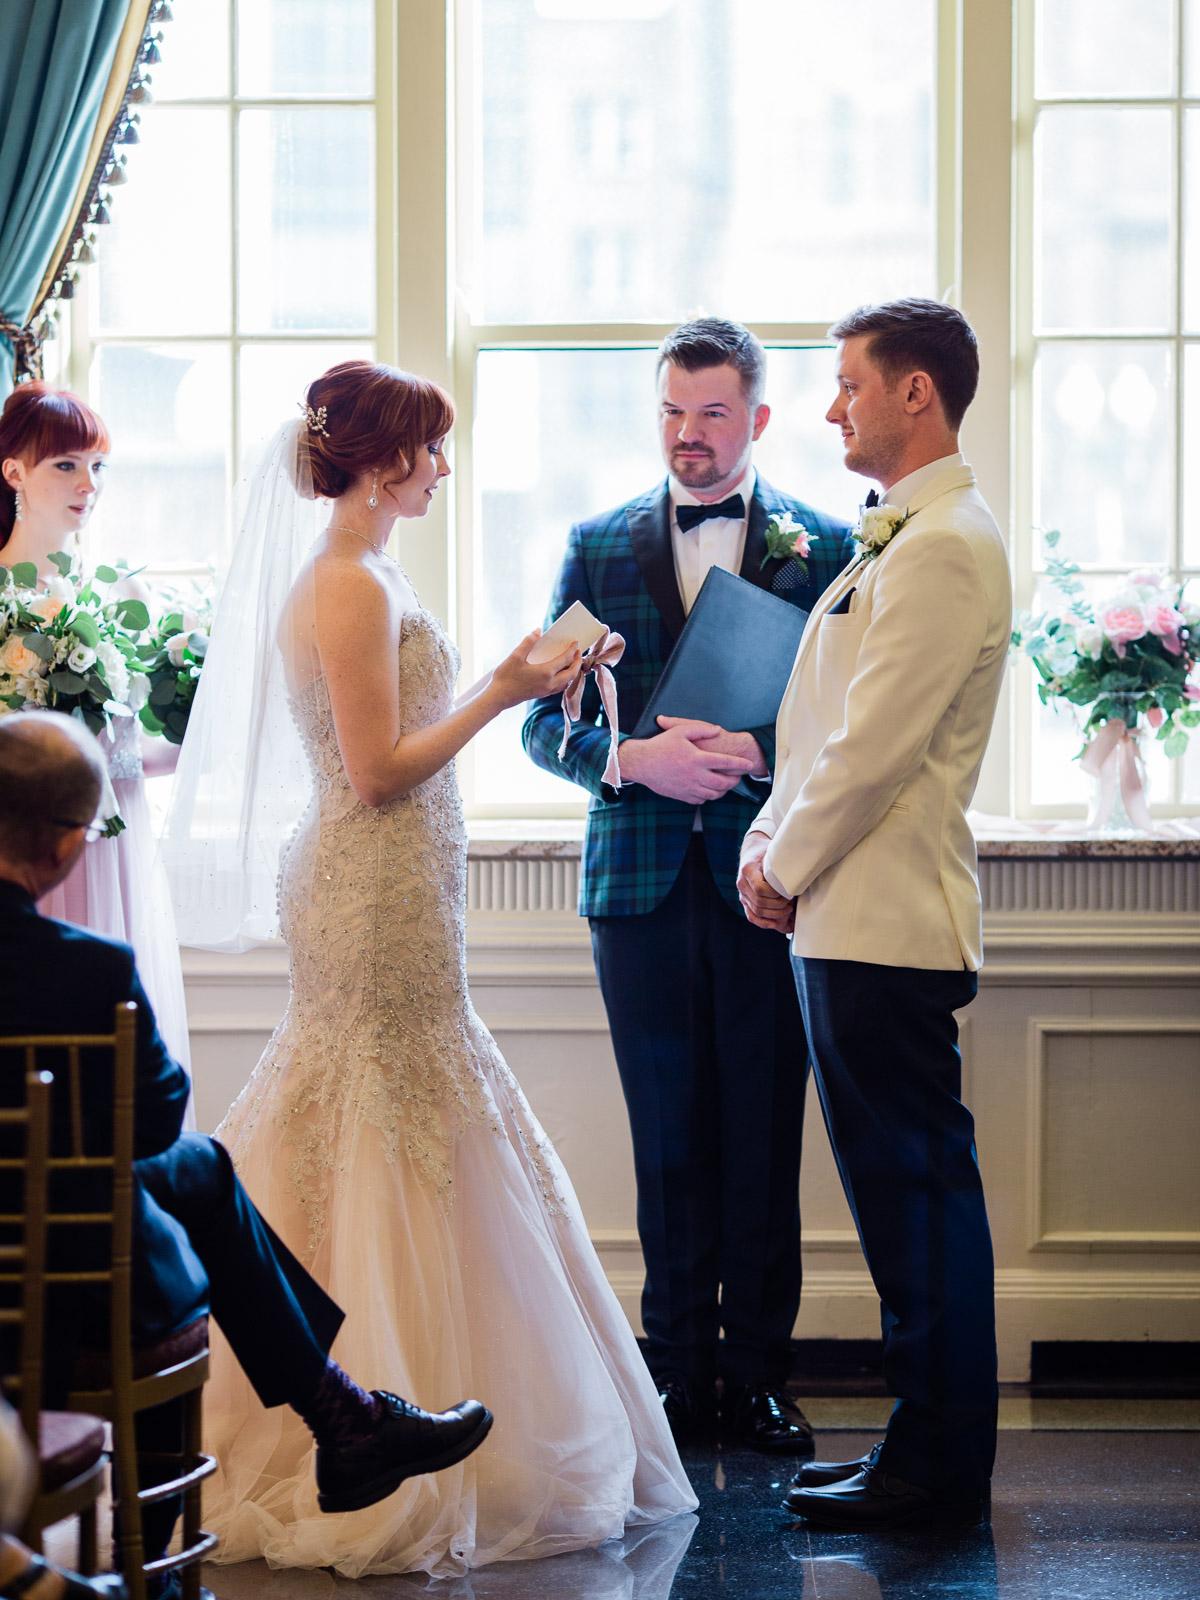 Intimate Onesto Wedding by Cleveland Wedding Photographer Matt Erickson Photography